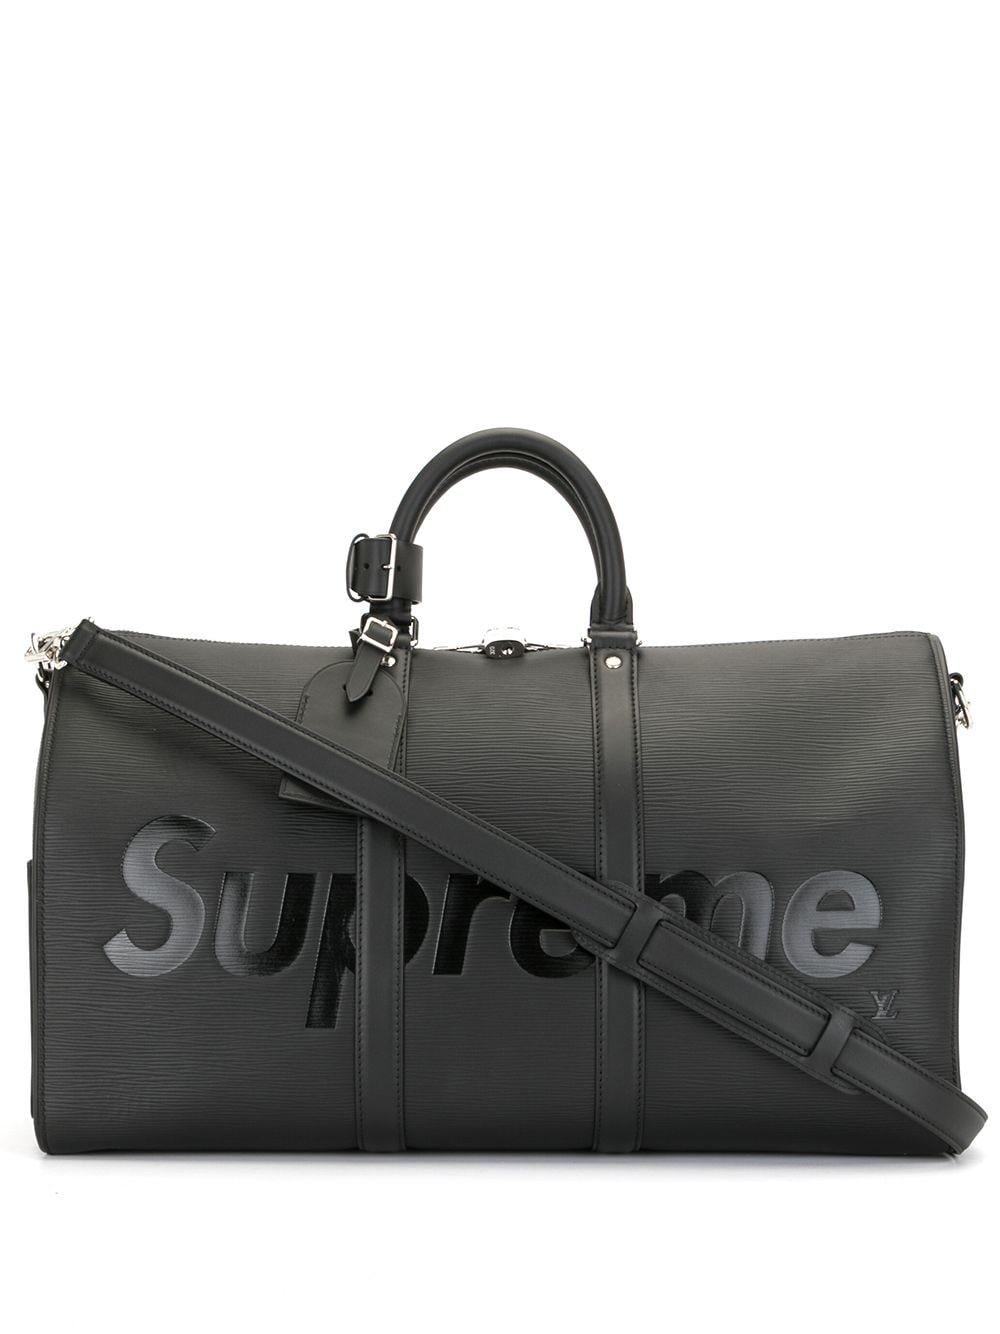 Louis Vuitton x Supreme 2017 pre-owned Epi Keepall Bandouliere Reisetasche - Schwarz